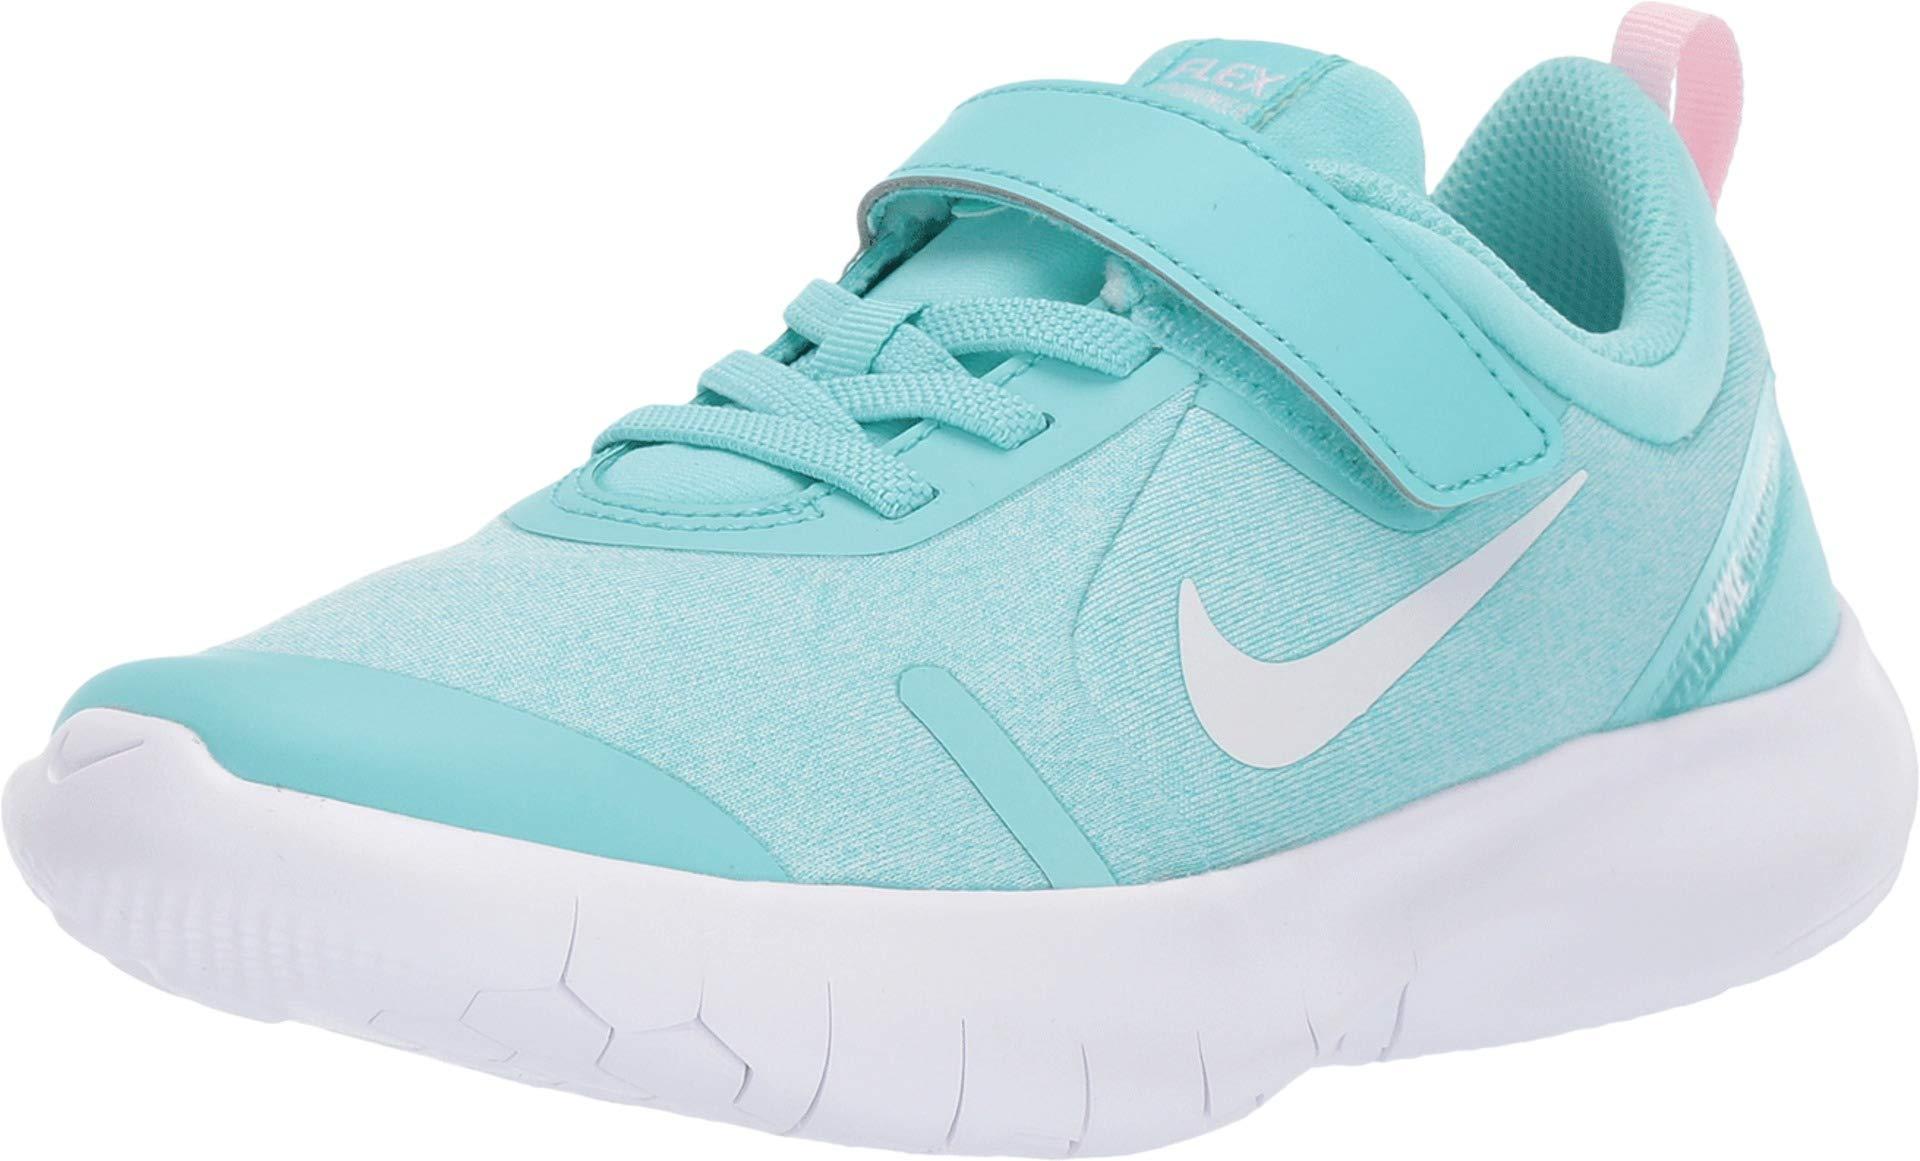 Nike Kids Girl's Flex Experience RN 8 (Little Kid) Light Aqua/White/Pink Foam/Teal Tint 1 M US Little Kid